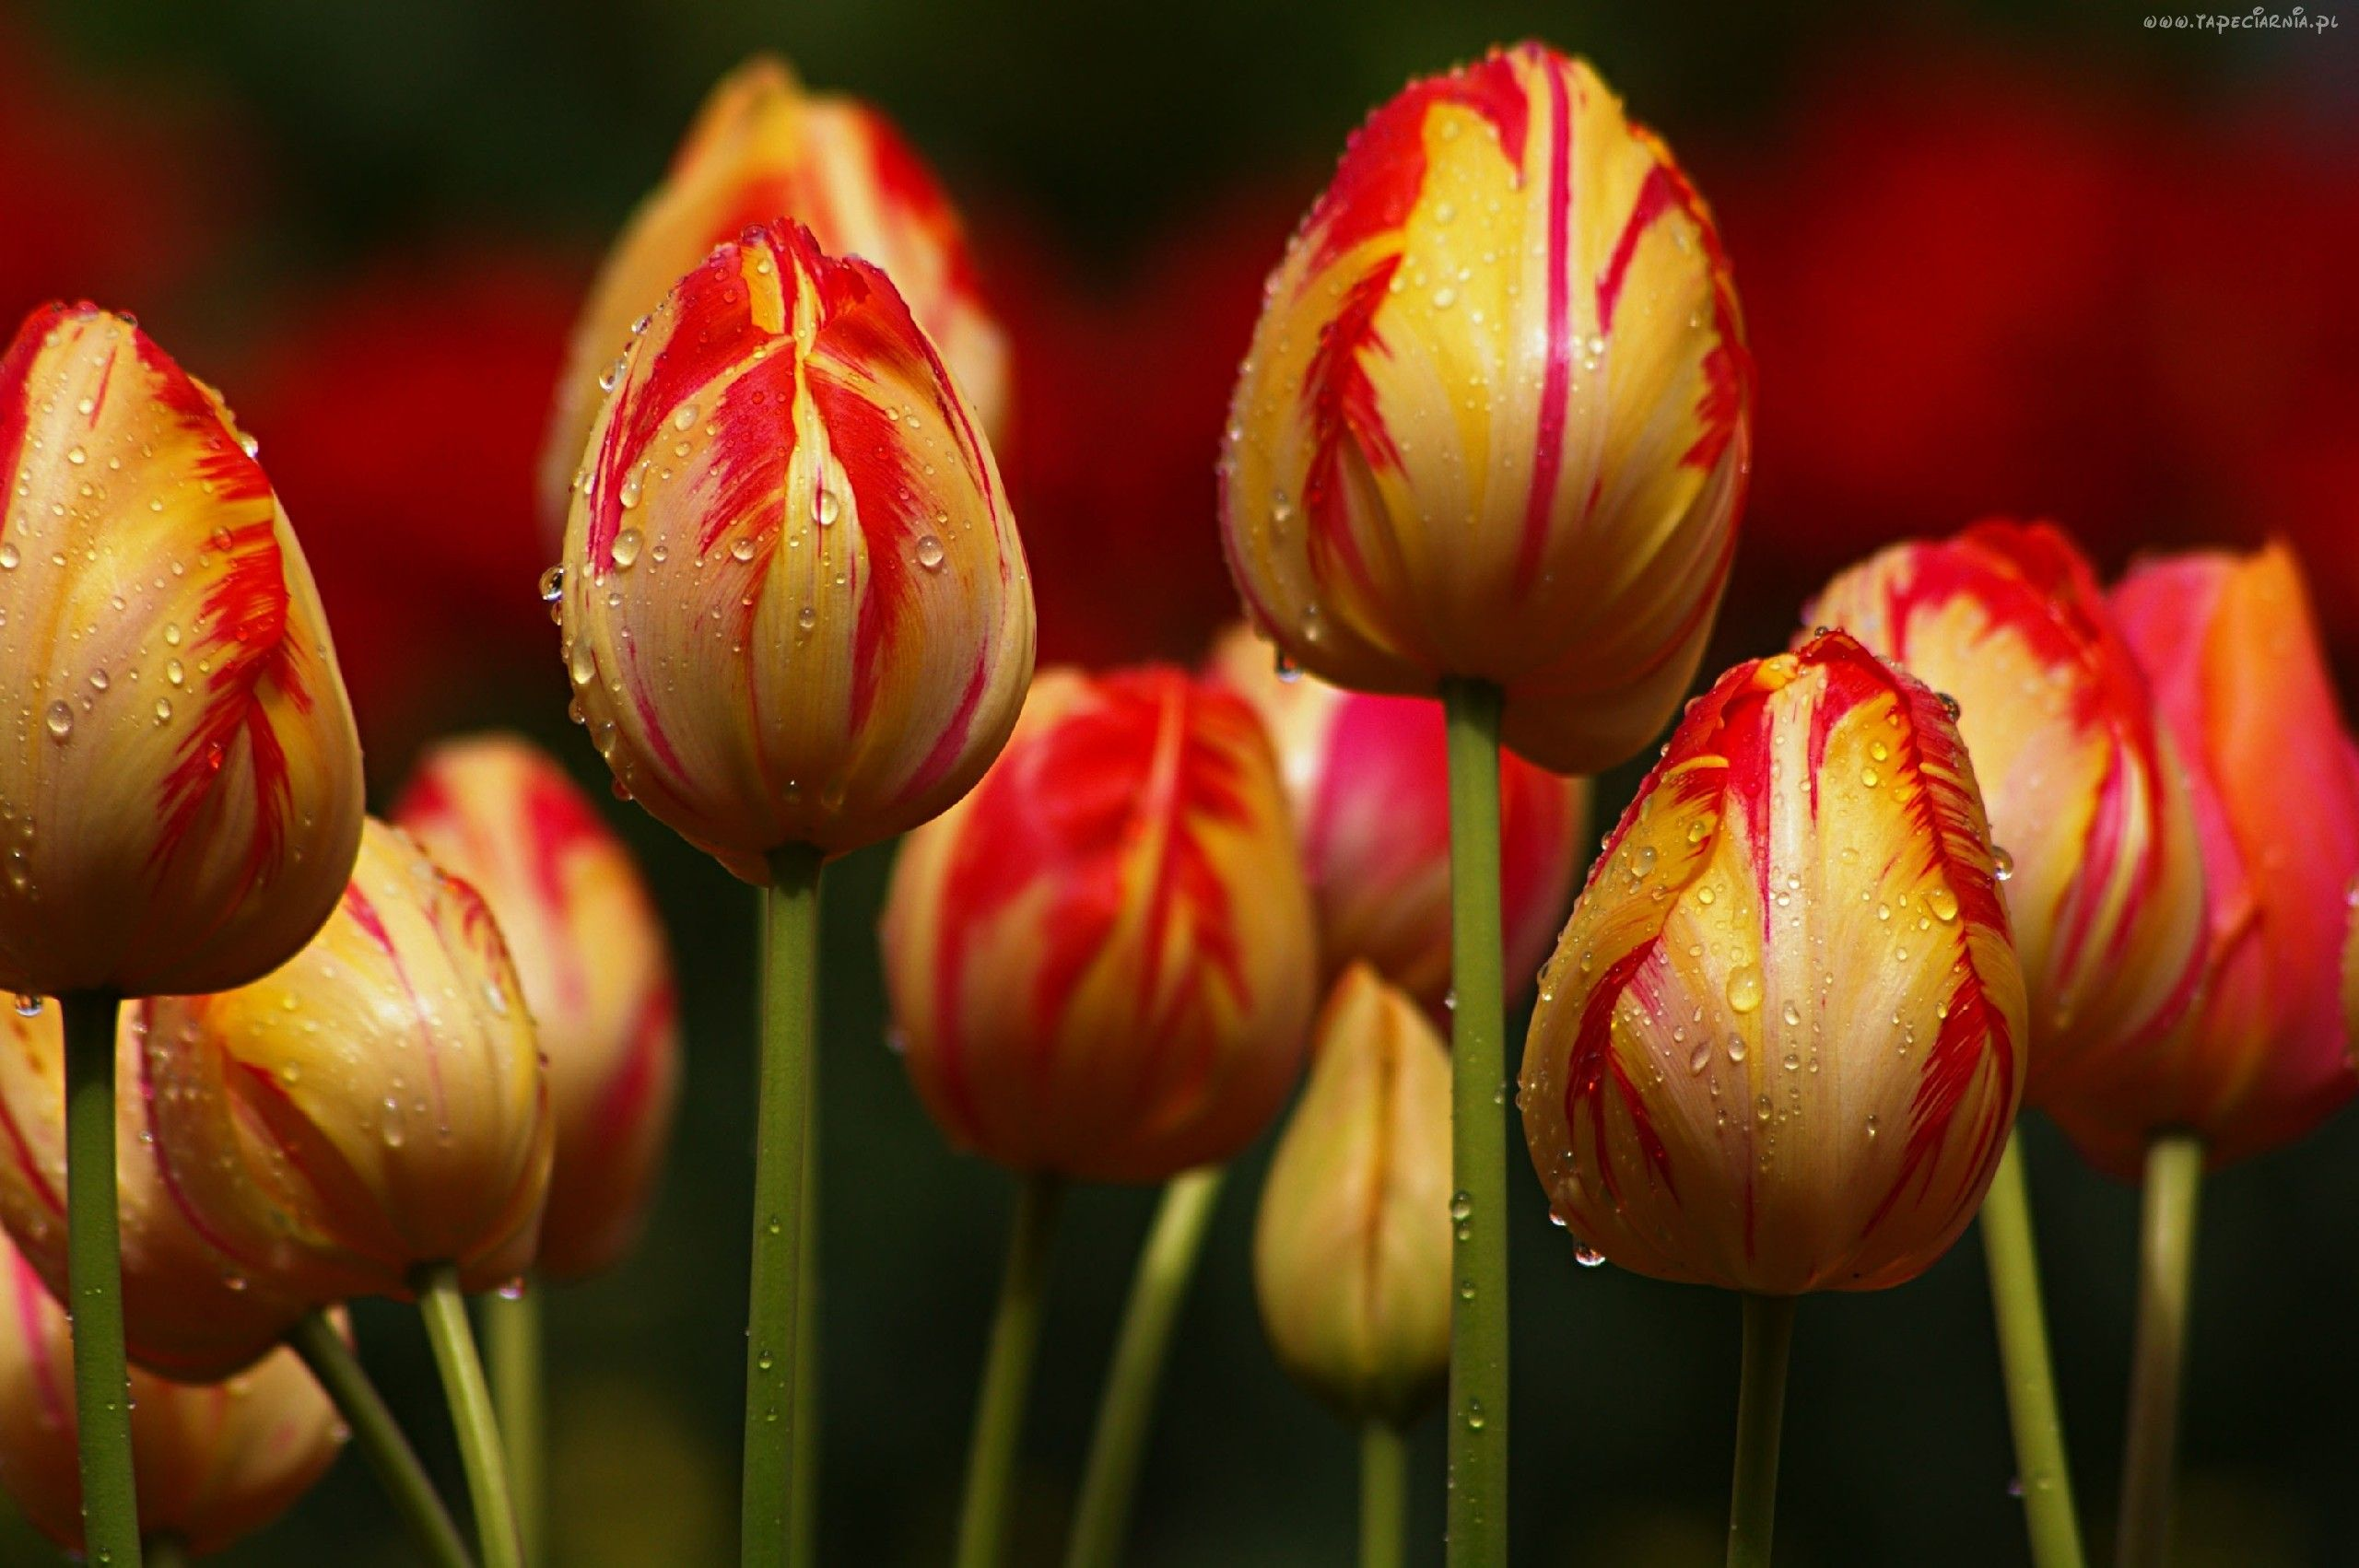 Czerwono Zolte Tulipany Krople Wody Tulips Images Tulips Flowers Tulips